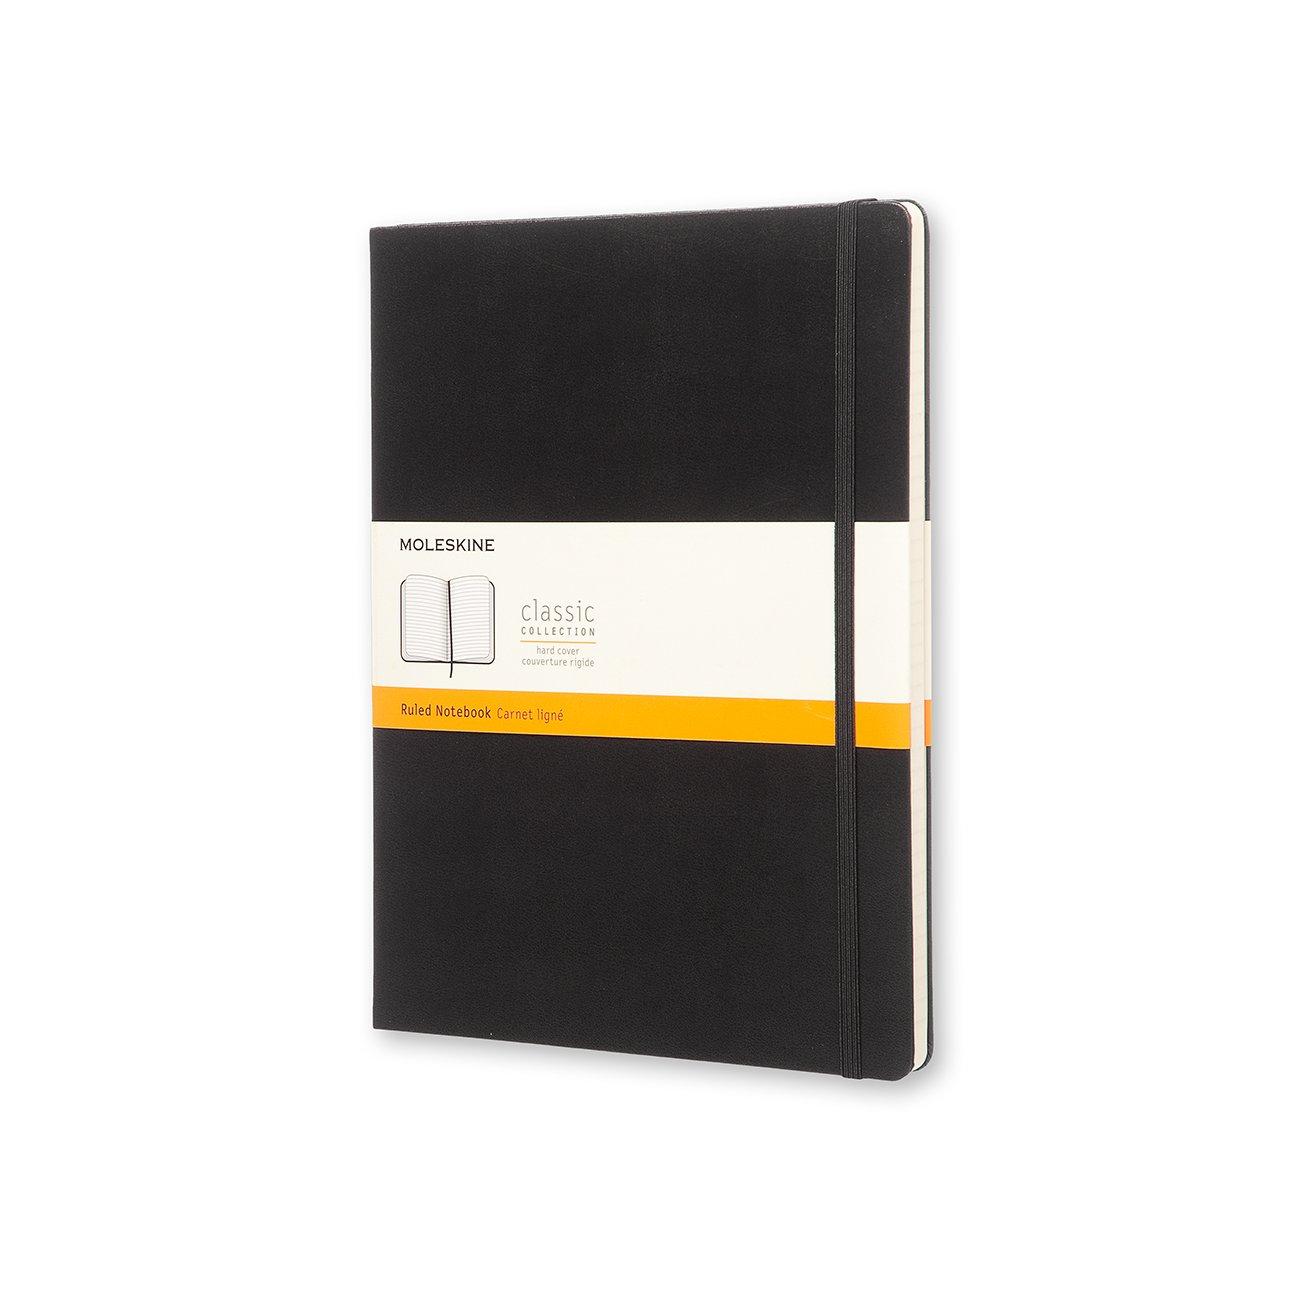 Moleskine Classic Notebook - Extra Large Hard Cover